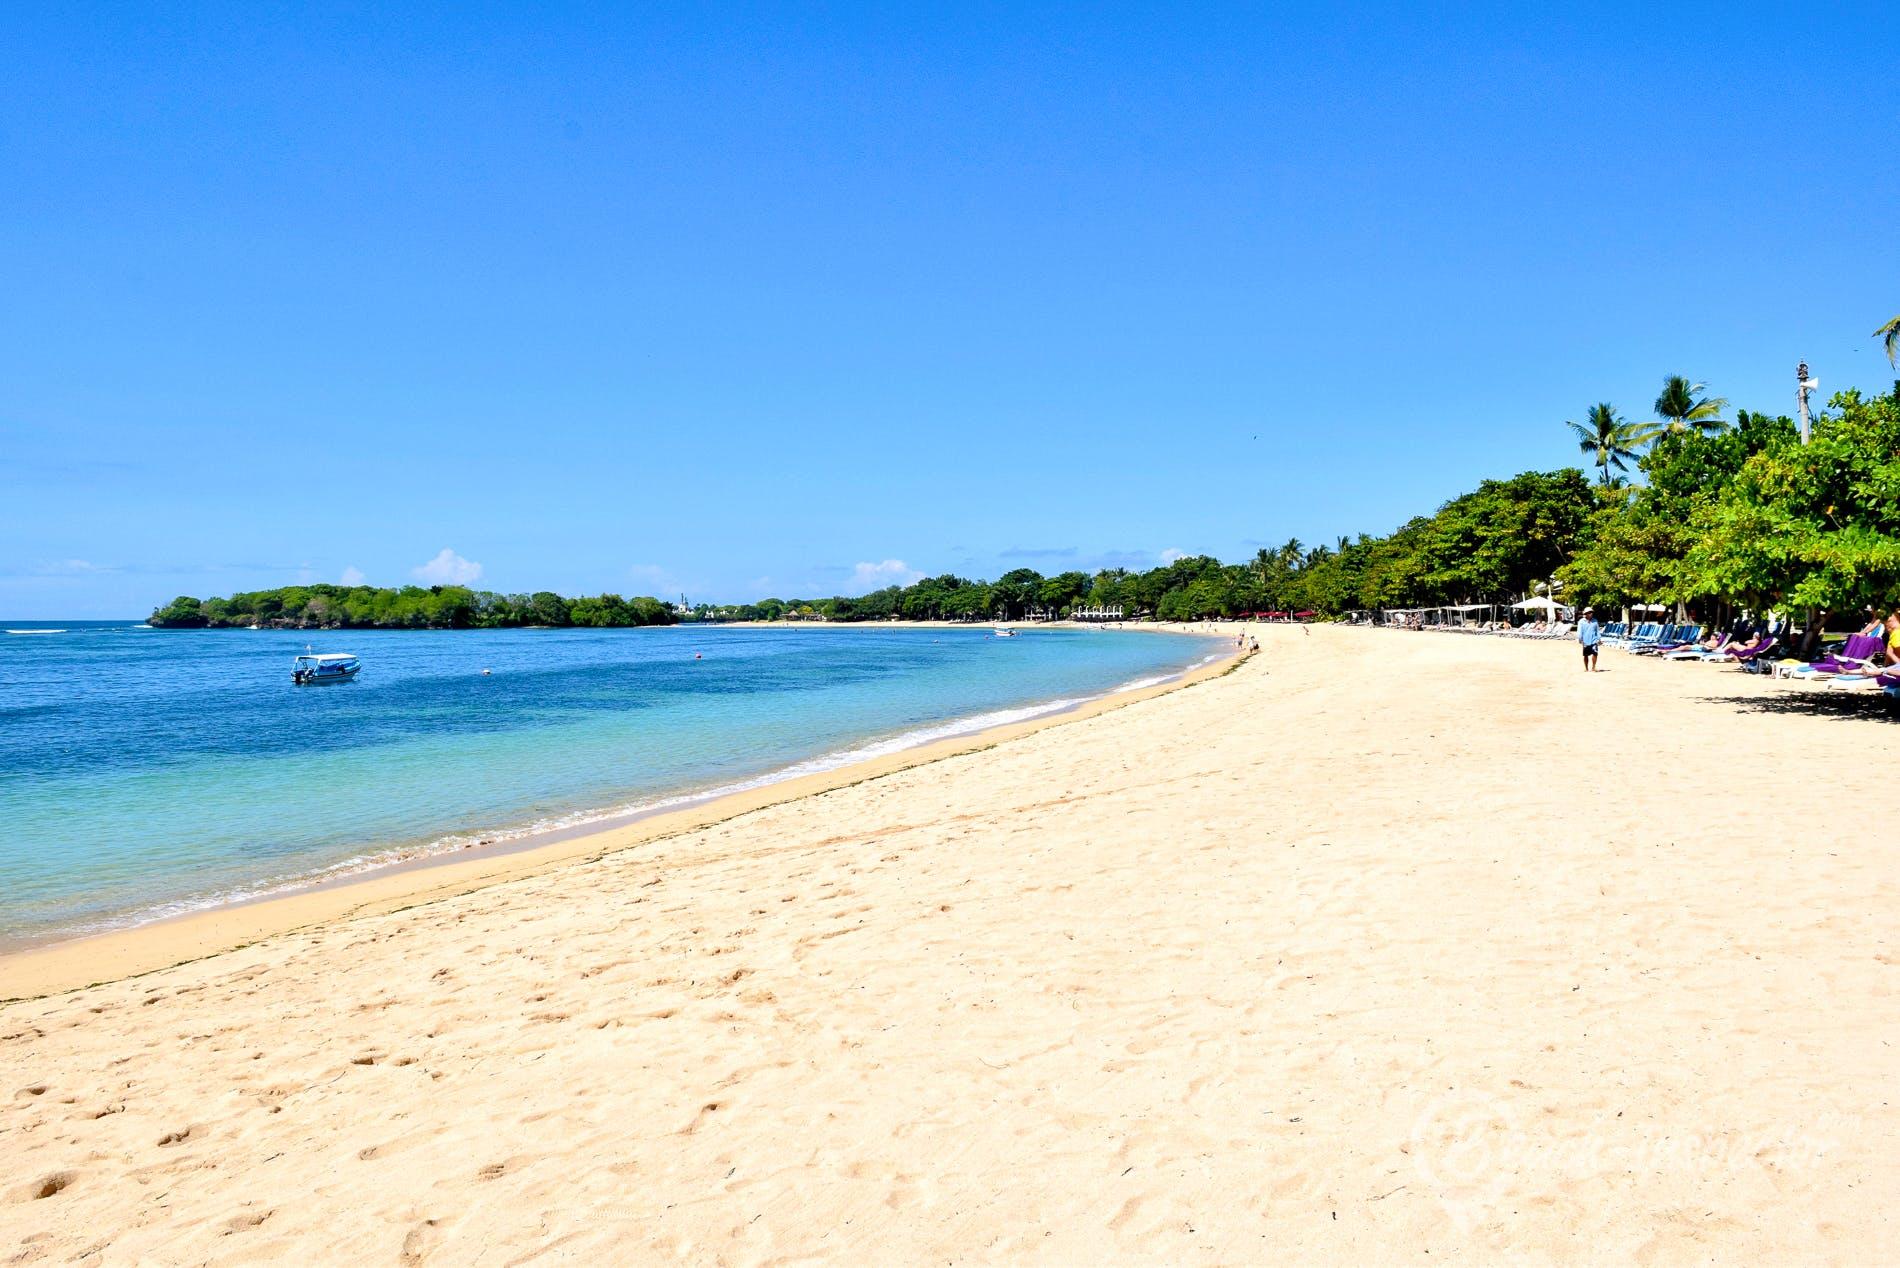 Strand Nusa Dua Beach, Bali, Indonesien